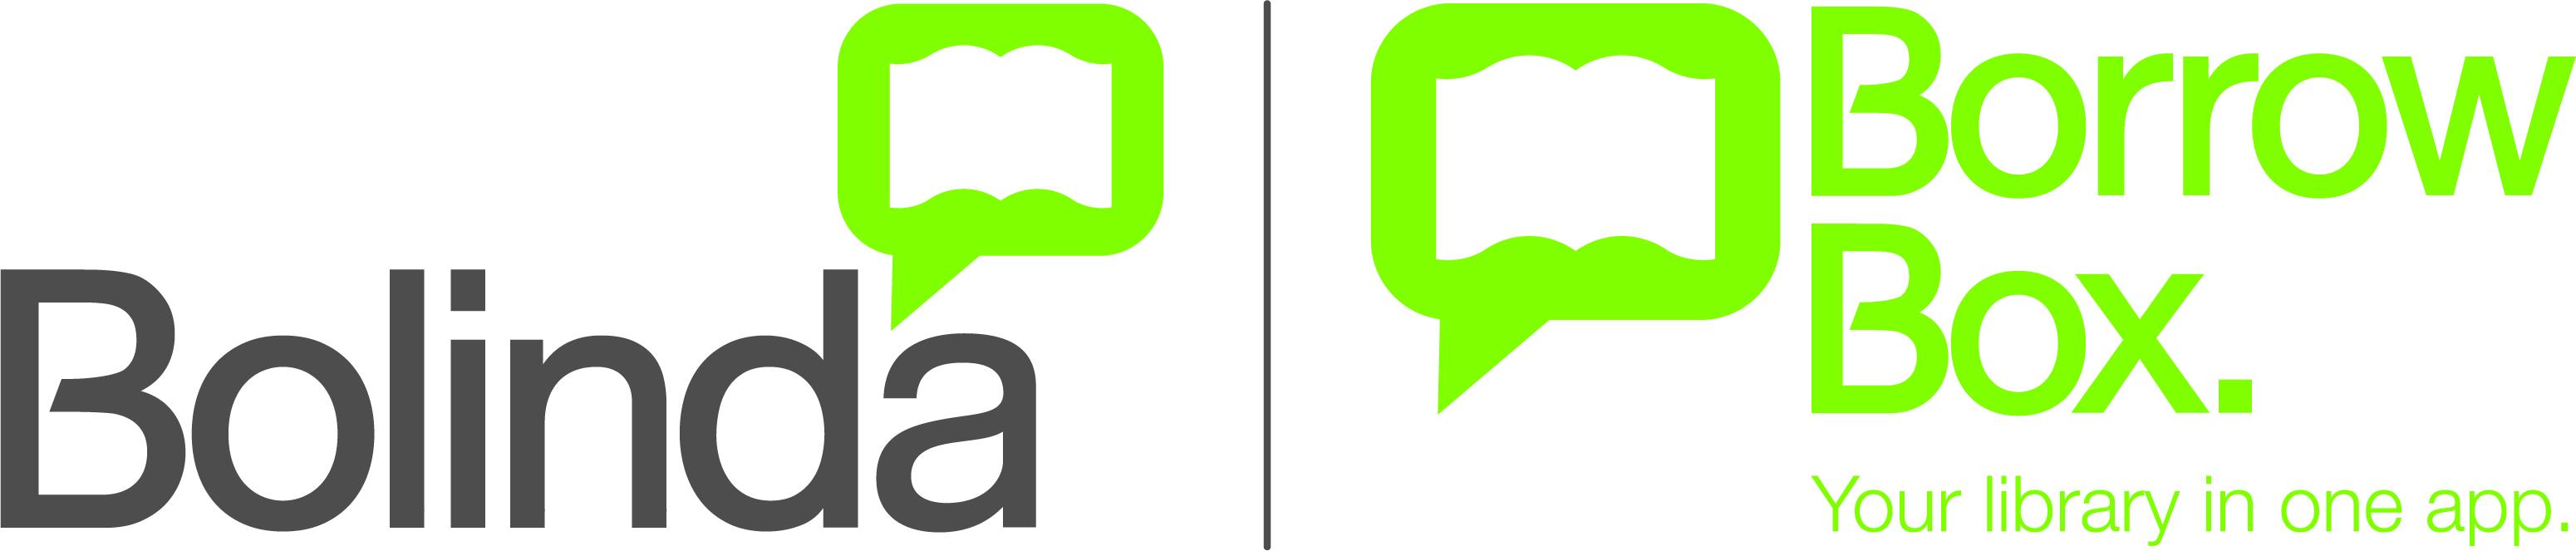 Bolinda_BorrowBox_Logo_CMYK